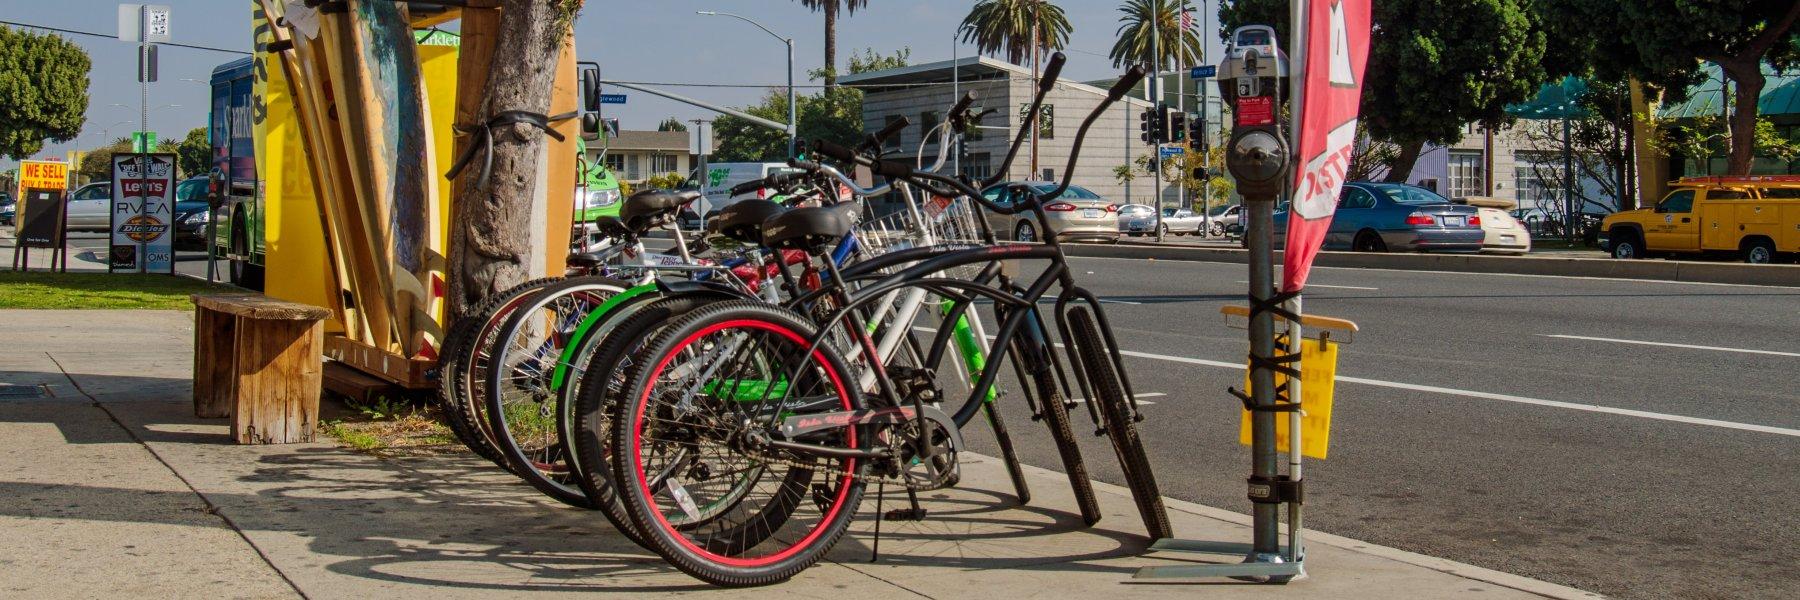 Mar Vista is a small nieghborhood in the West Los Angeles area